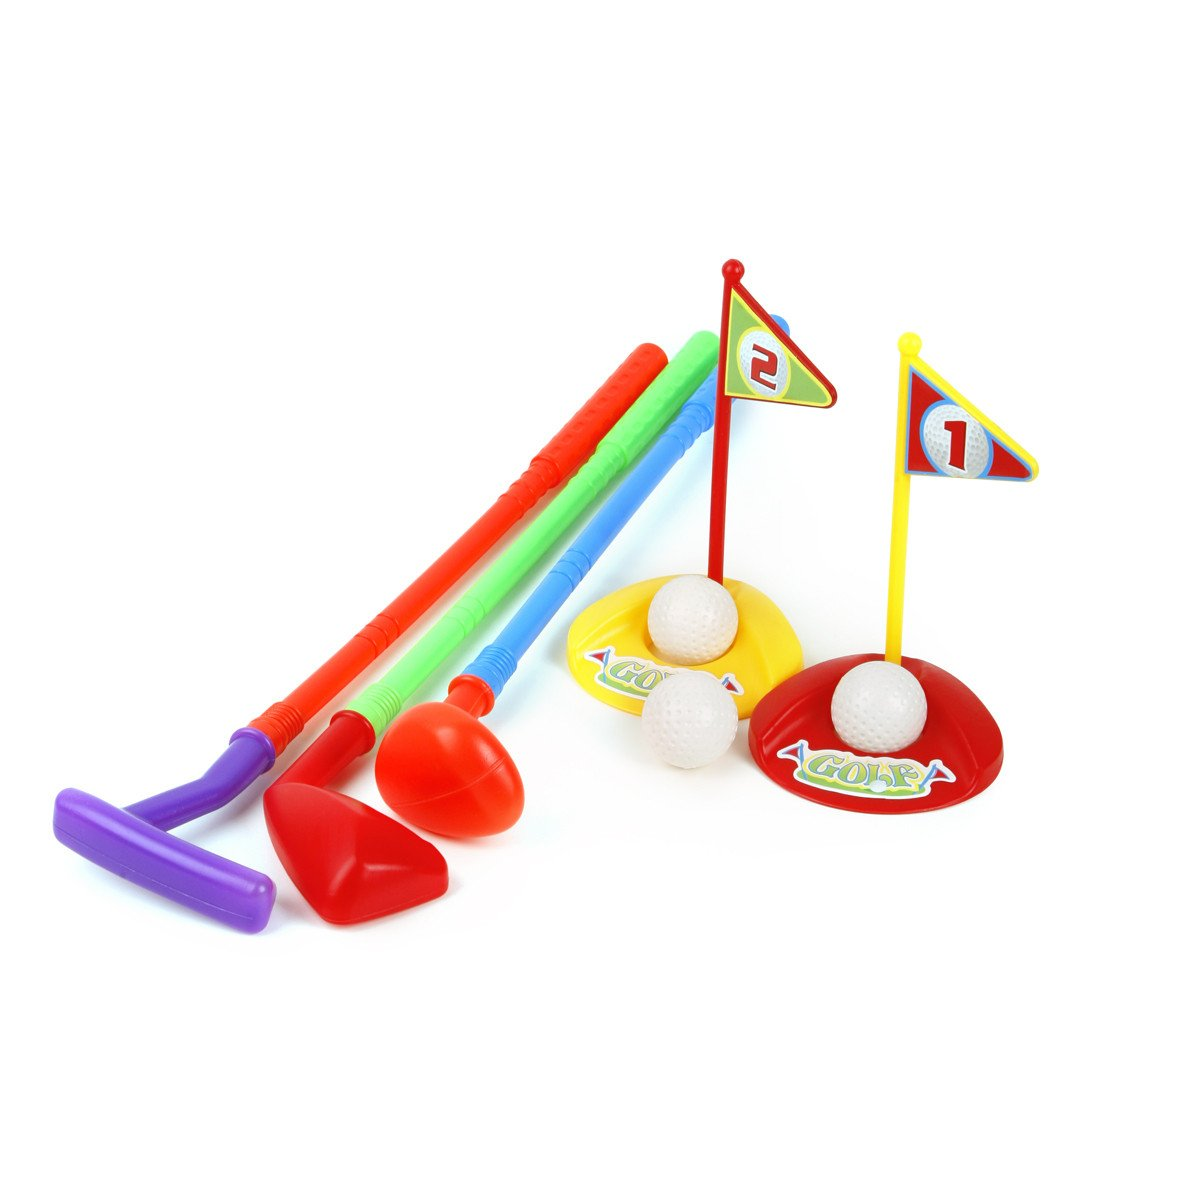 Ojam Swing 'N Play Kids Toy Golf Set (9) (9 Piece) by Ojam (Image #3)